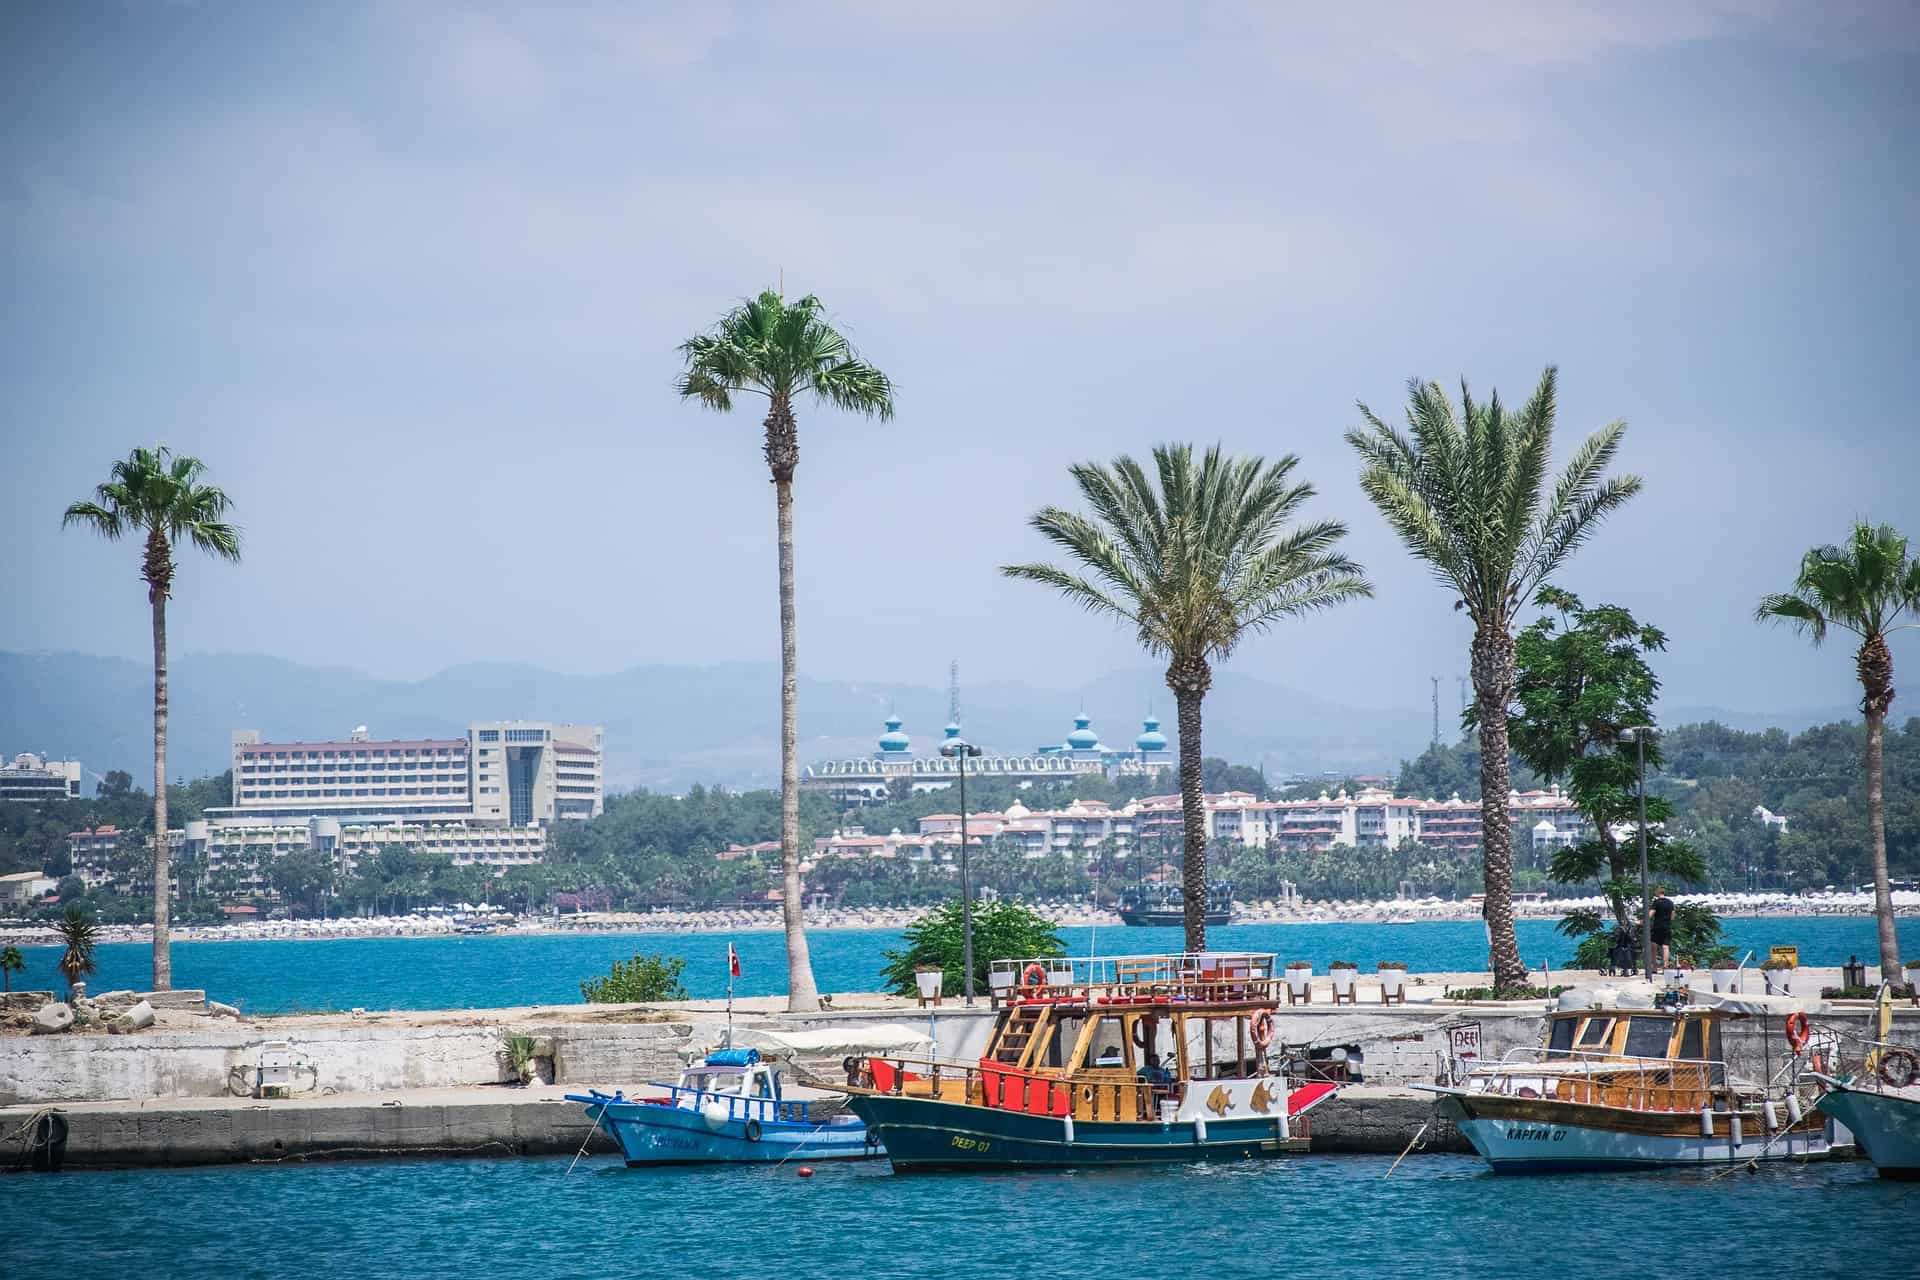 Türkei Urlaub 2020 - All Inclusive nur 160,00€ 1 Woche Side